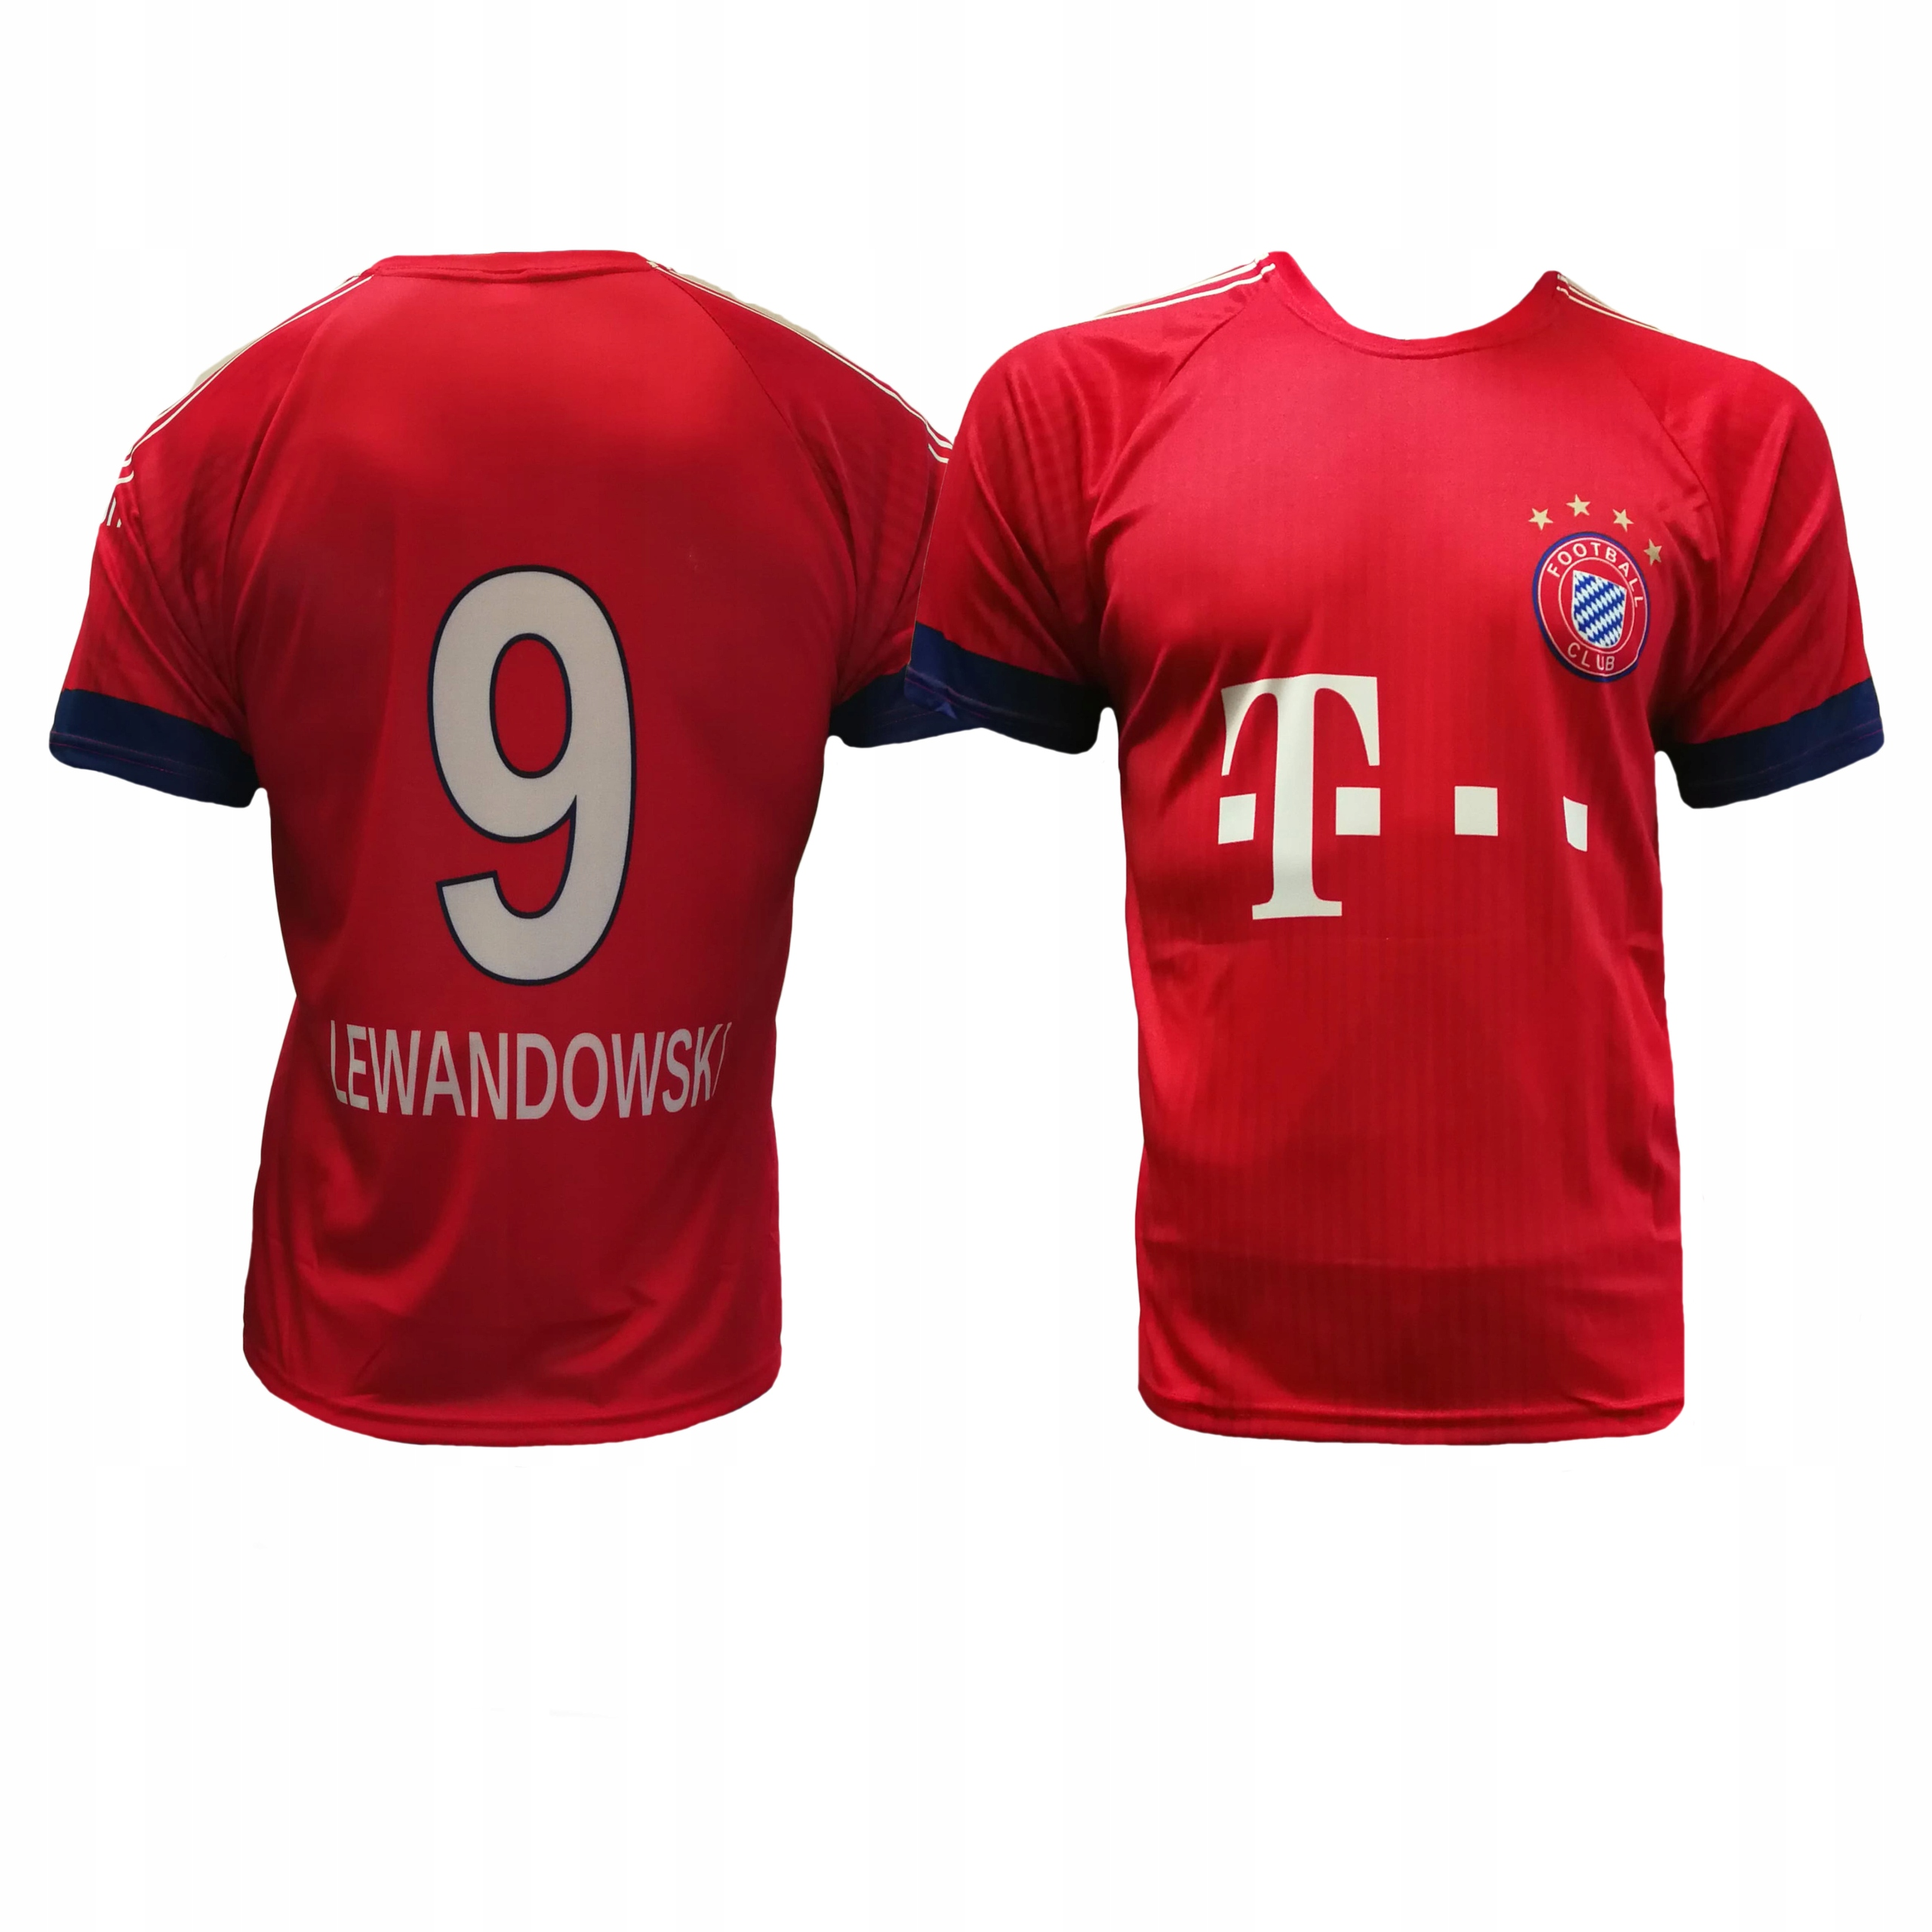 3b40f6f87 Komplet piłkarski Reda Lewandowski Bayern - r140. KOSZULKA LEWANDOWSKI  BAYERN MONACHIUM 116cm i inne